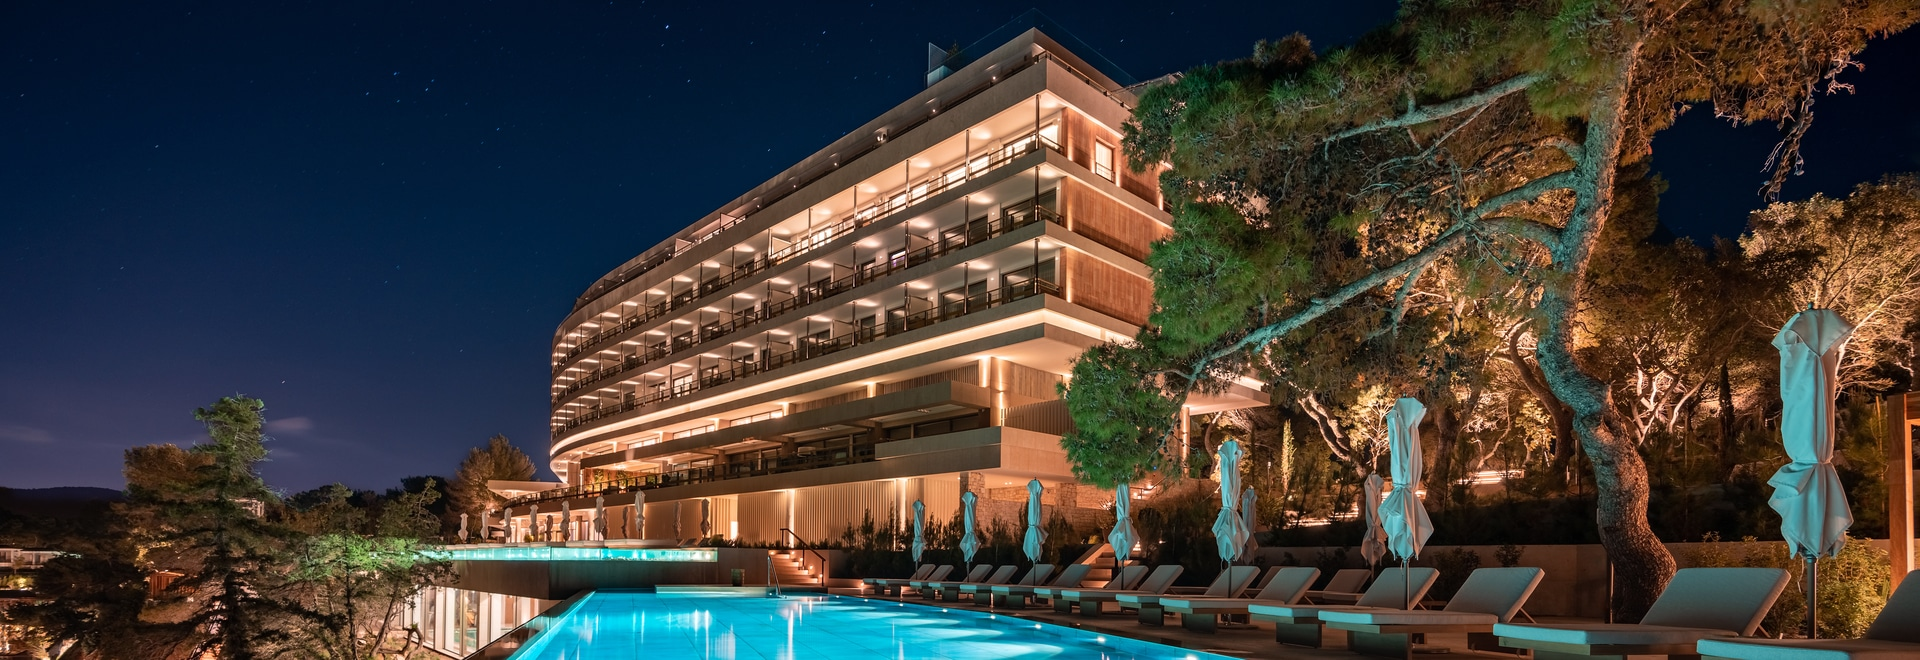 Four Seasons Hotel, Arion